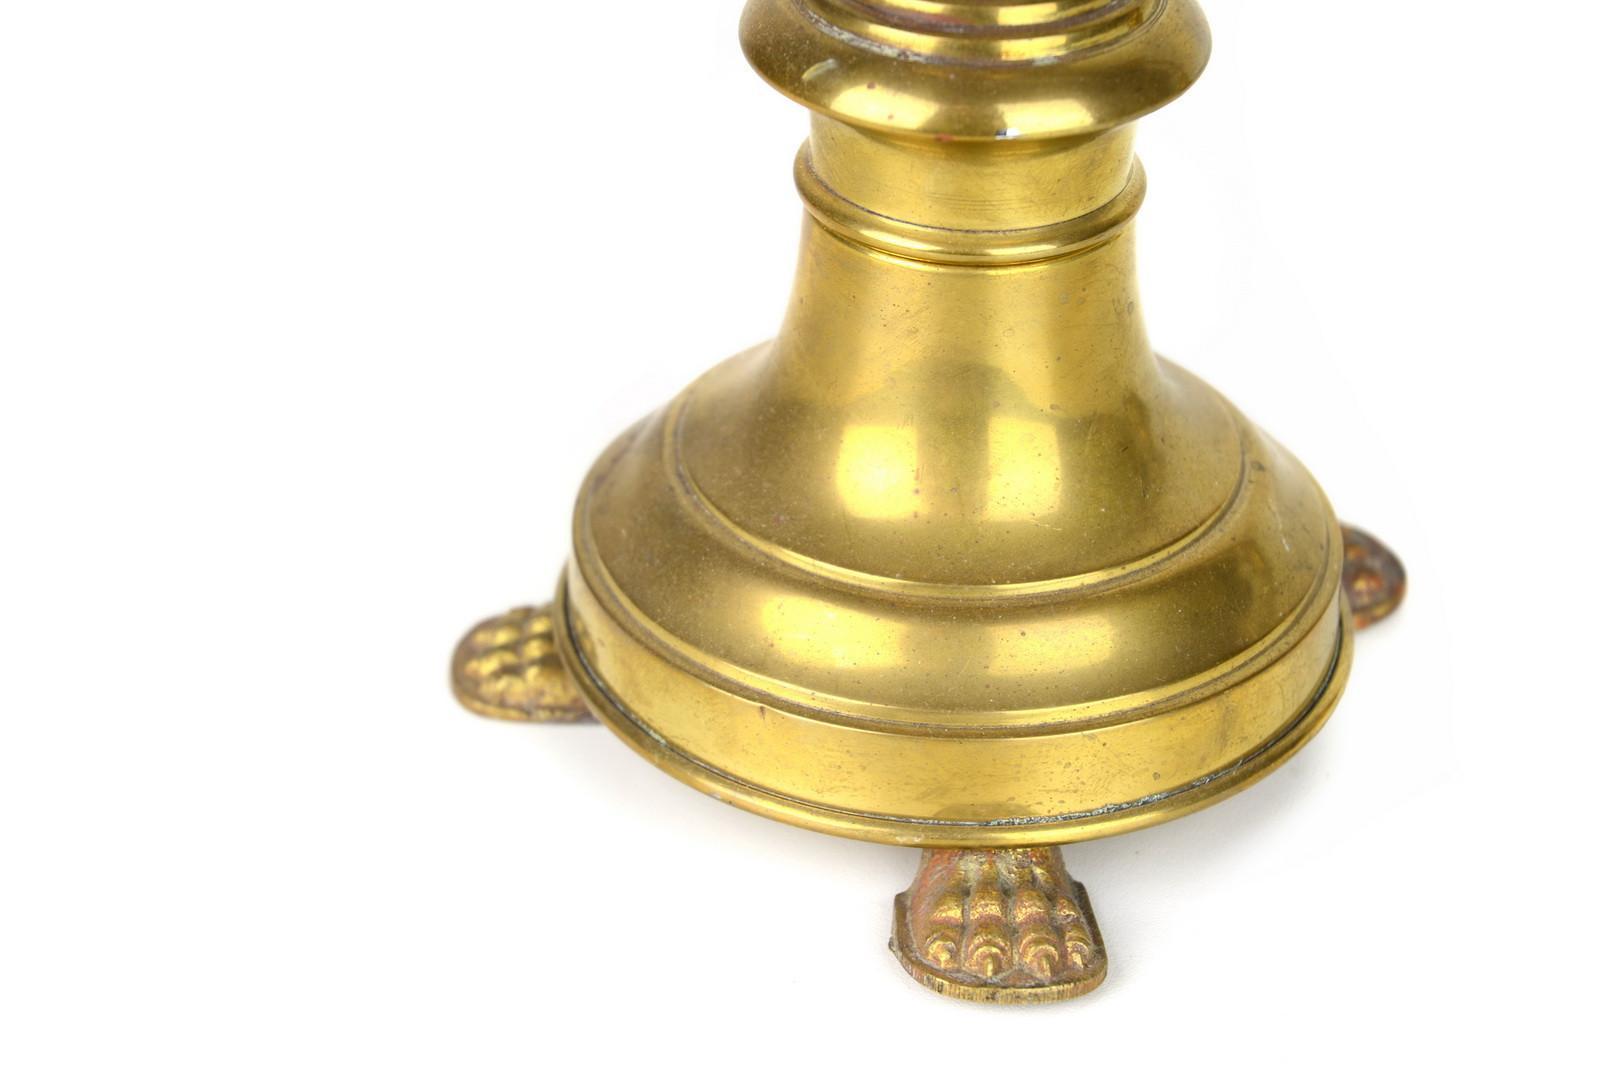 antichi-candelabri-in-ottone-dorato-1,2979.jpg?WebbinsCacheCounter=1